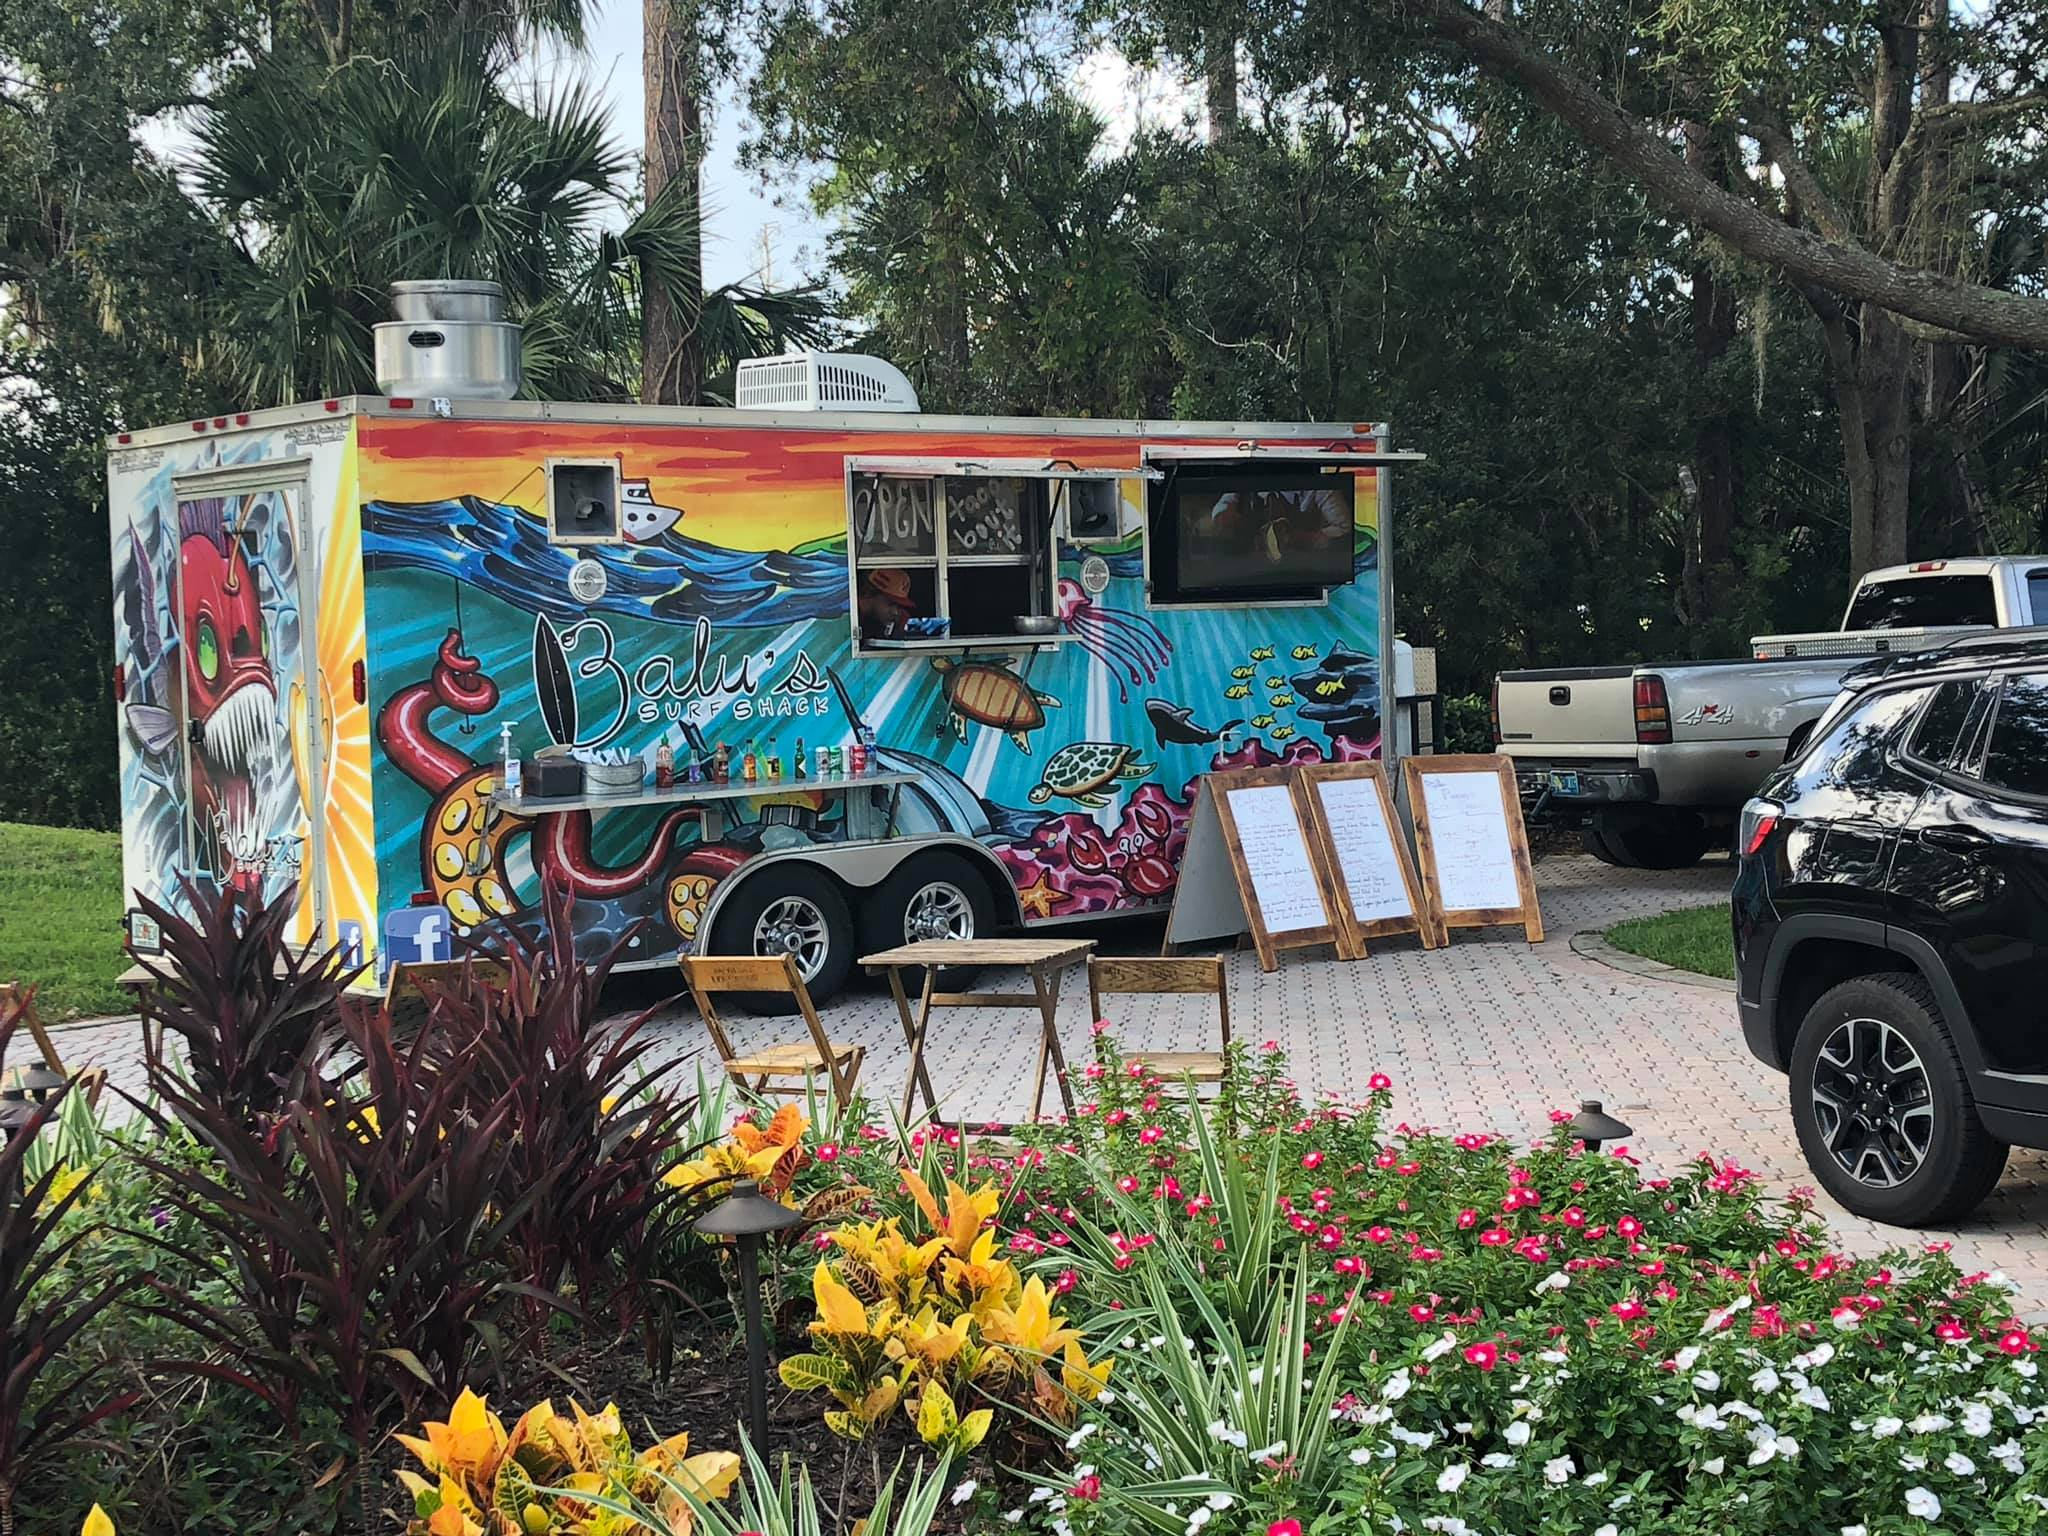 Balu's Surf Shack Food Truck